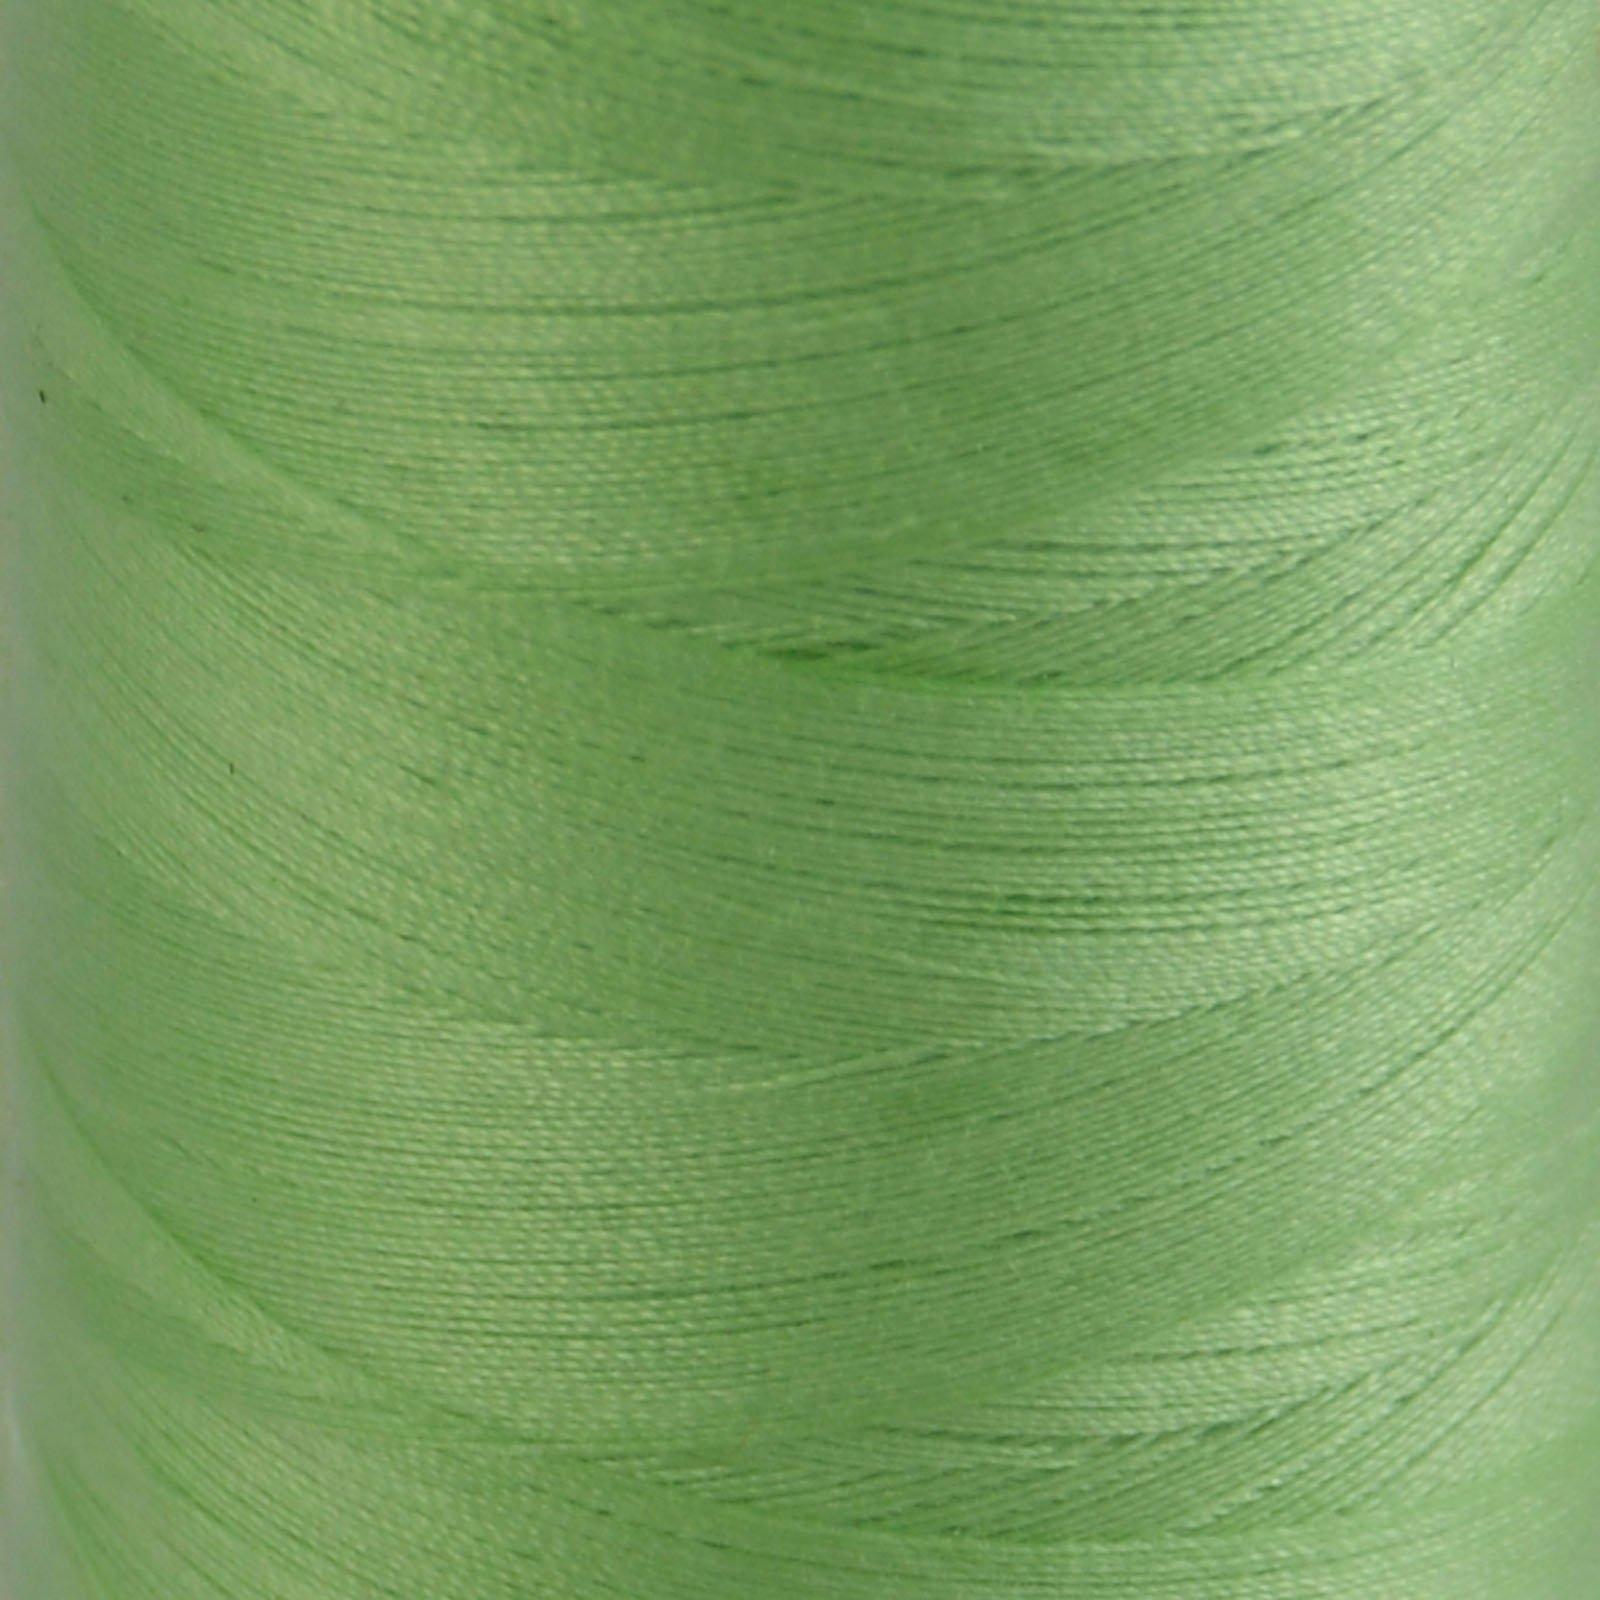 # 2880 Pale Green